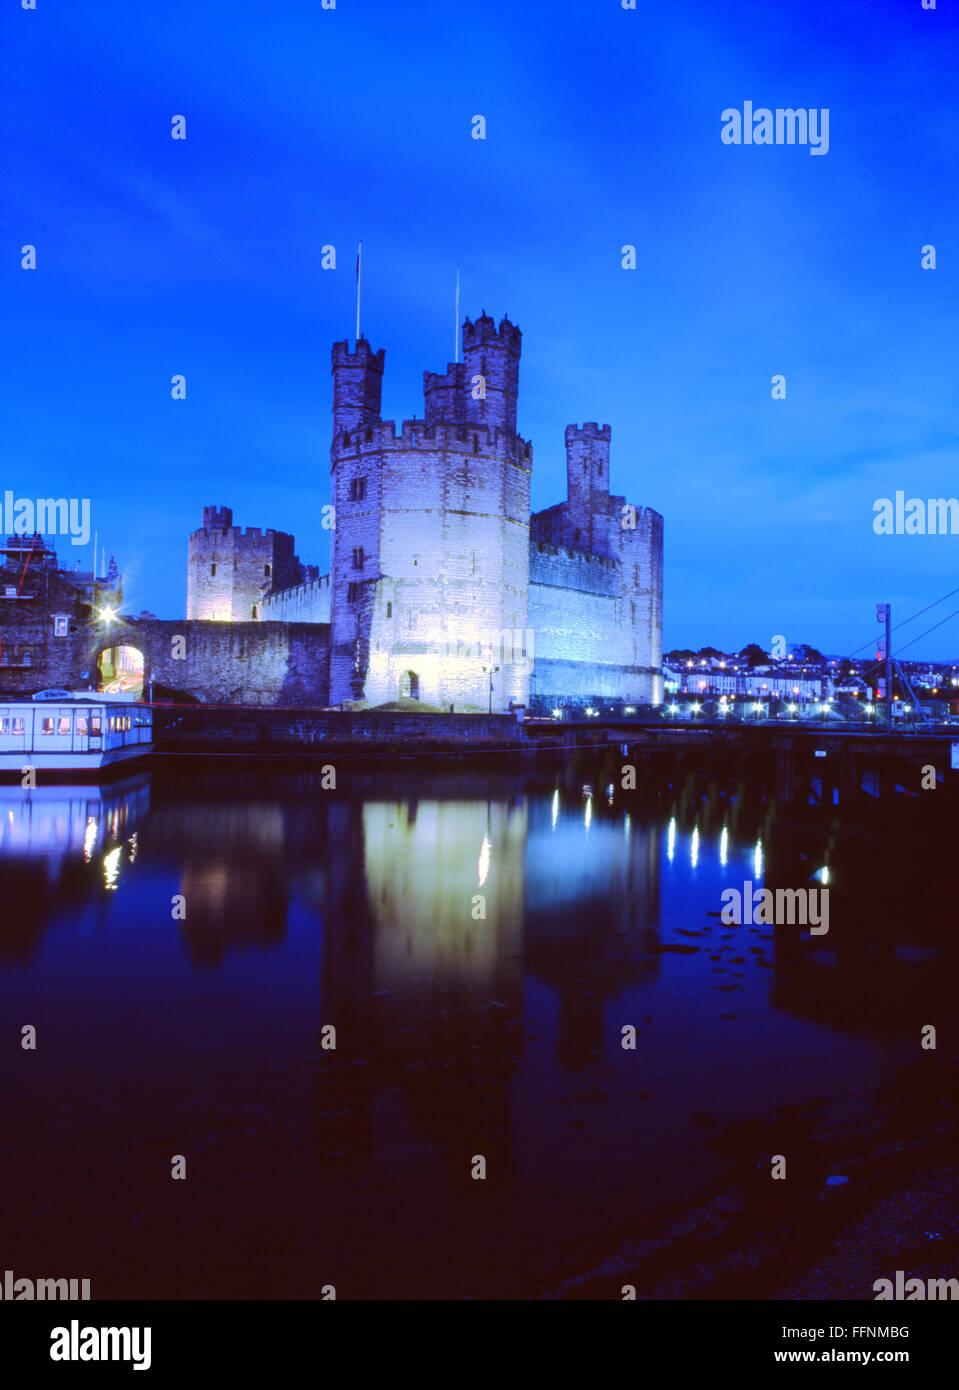 Caernarfon Castle and Seiont estuary at night dusk twilight Gwynedd North Wales UK Stock Photo